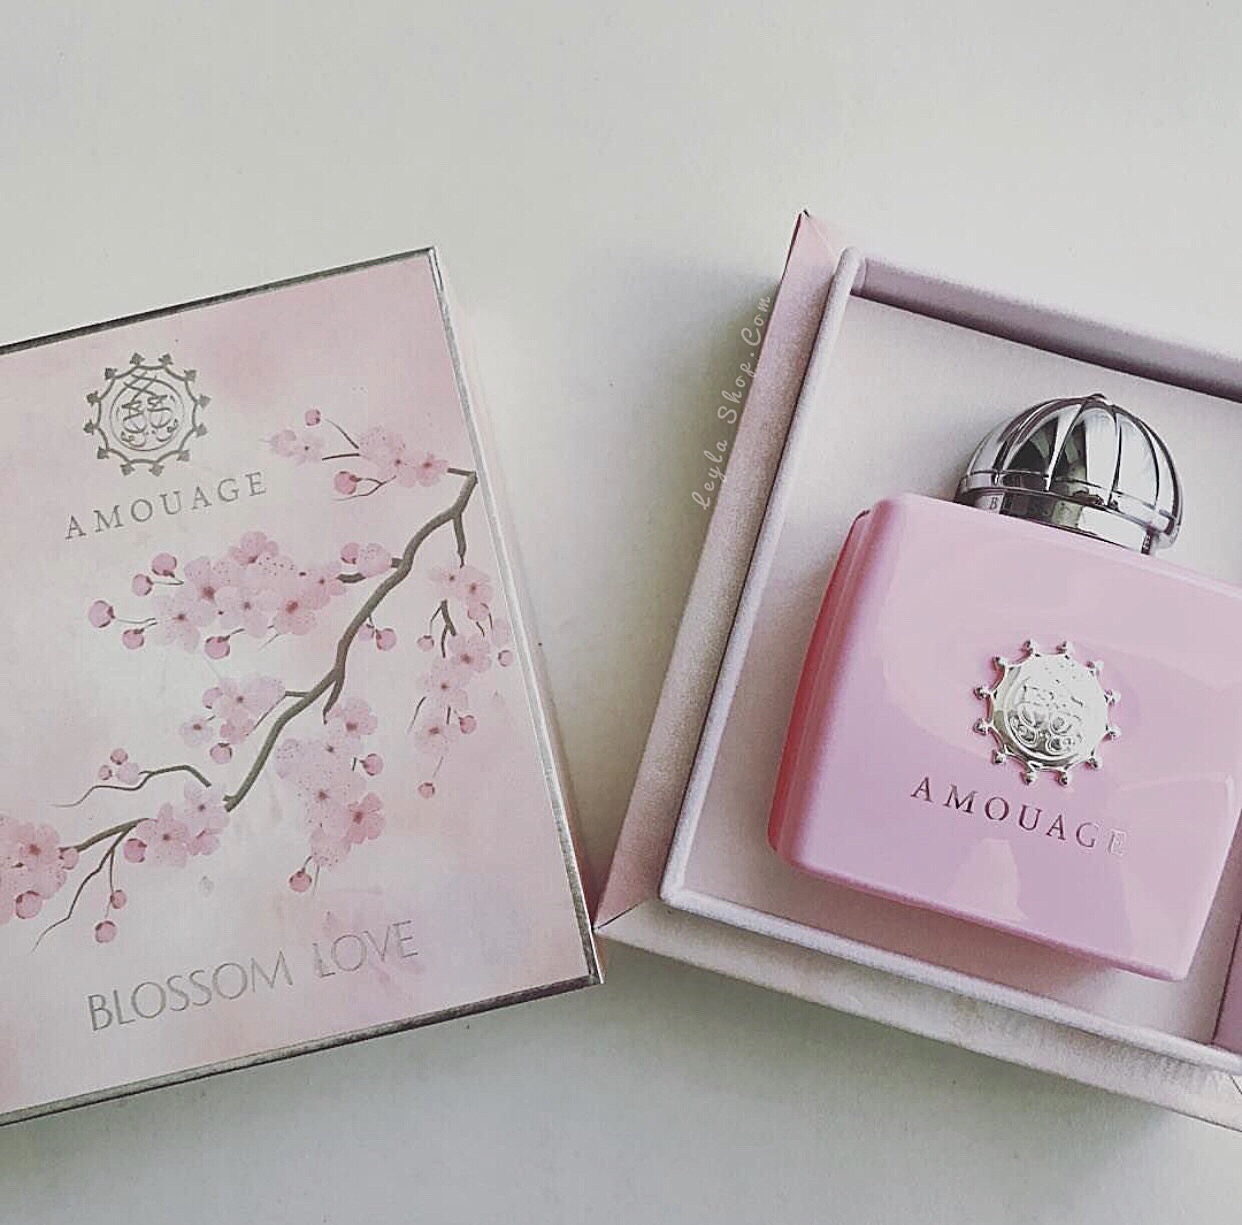 Amouage - Blossom Love